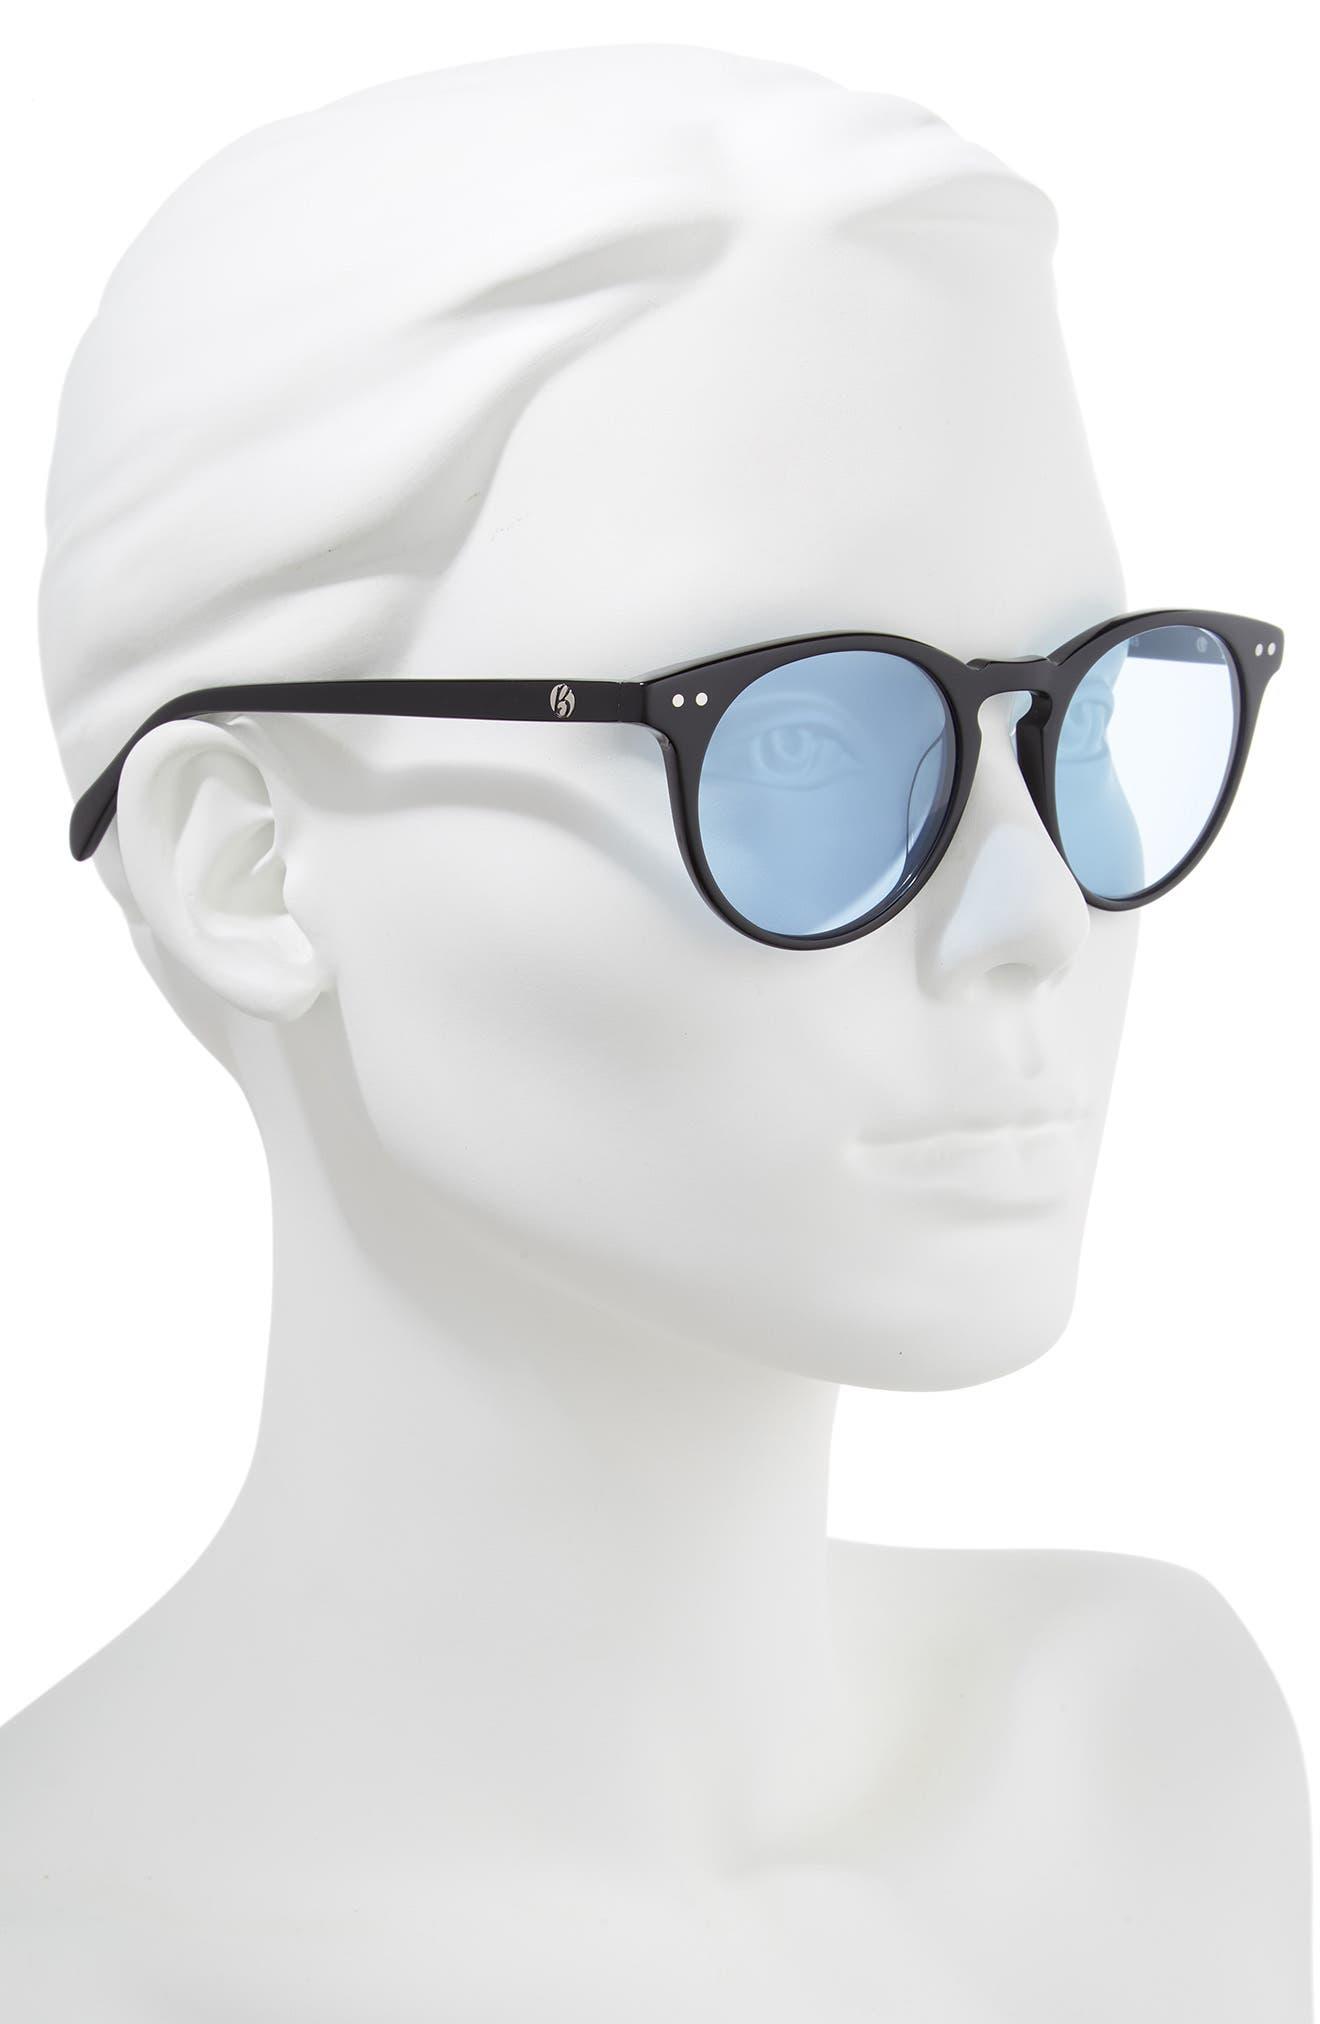 Oxford 49mm Sunglasses,                             Alternate thumbnail 2, color,                             BLACK/ ARCTIC BLUE